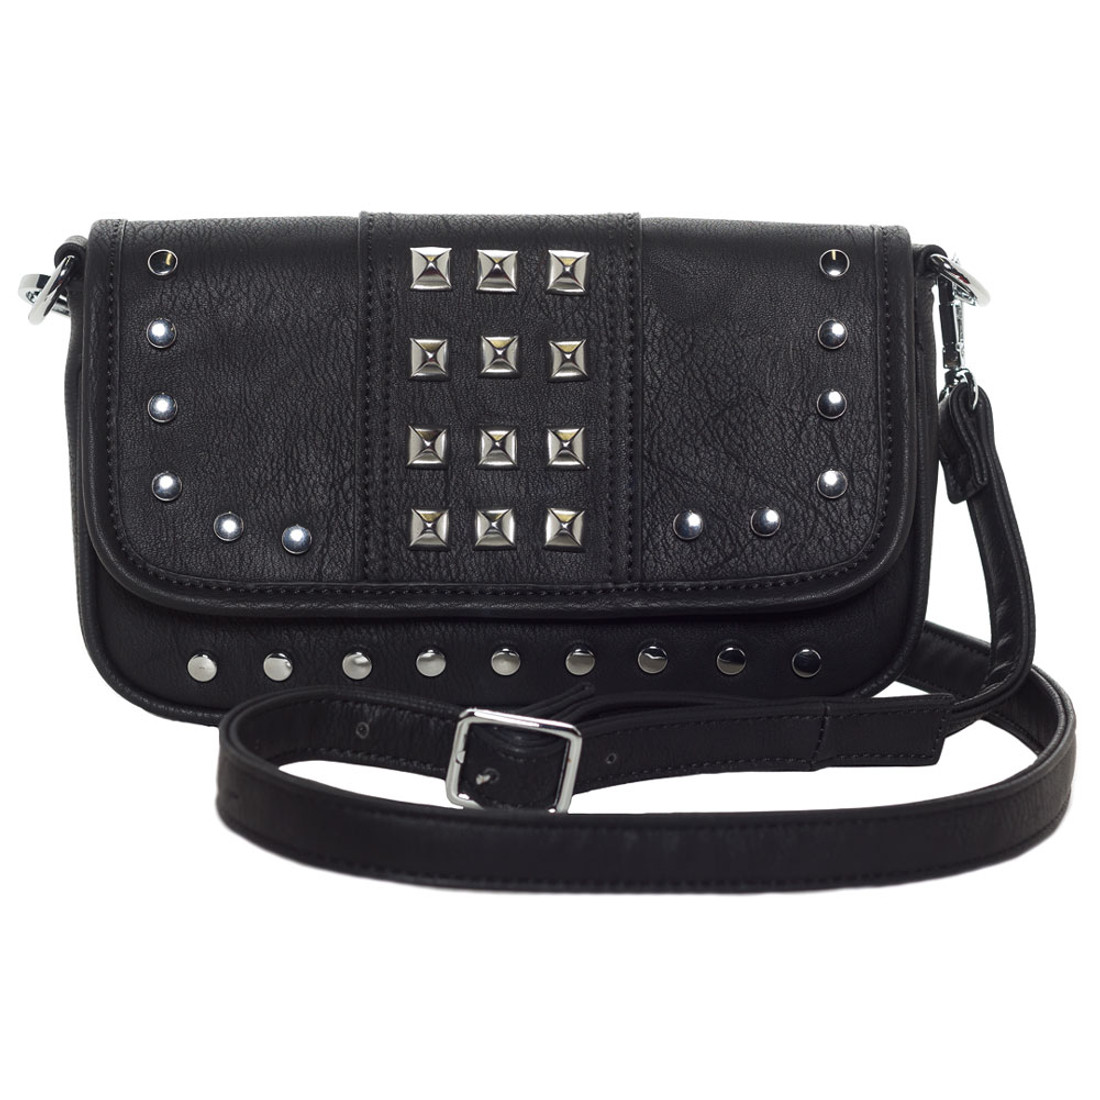 Sourpuss Black Purse Aime Clutch Crossbody Shoulder Bag